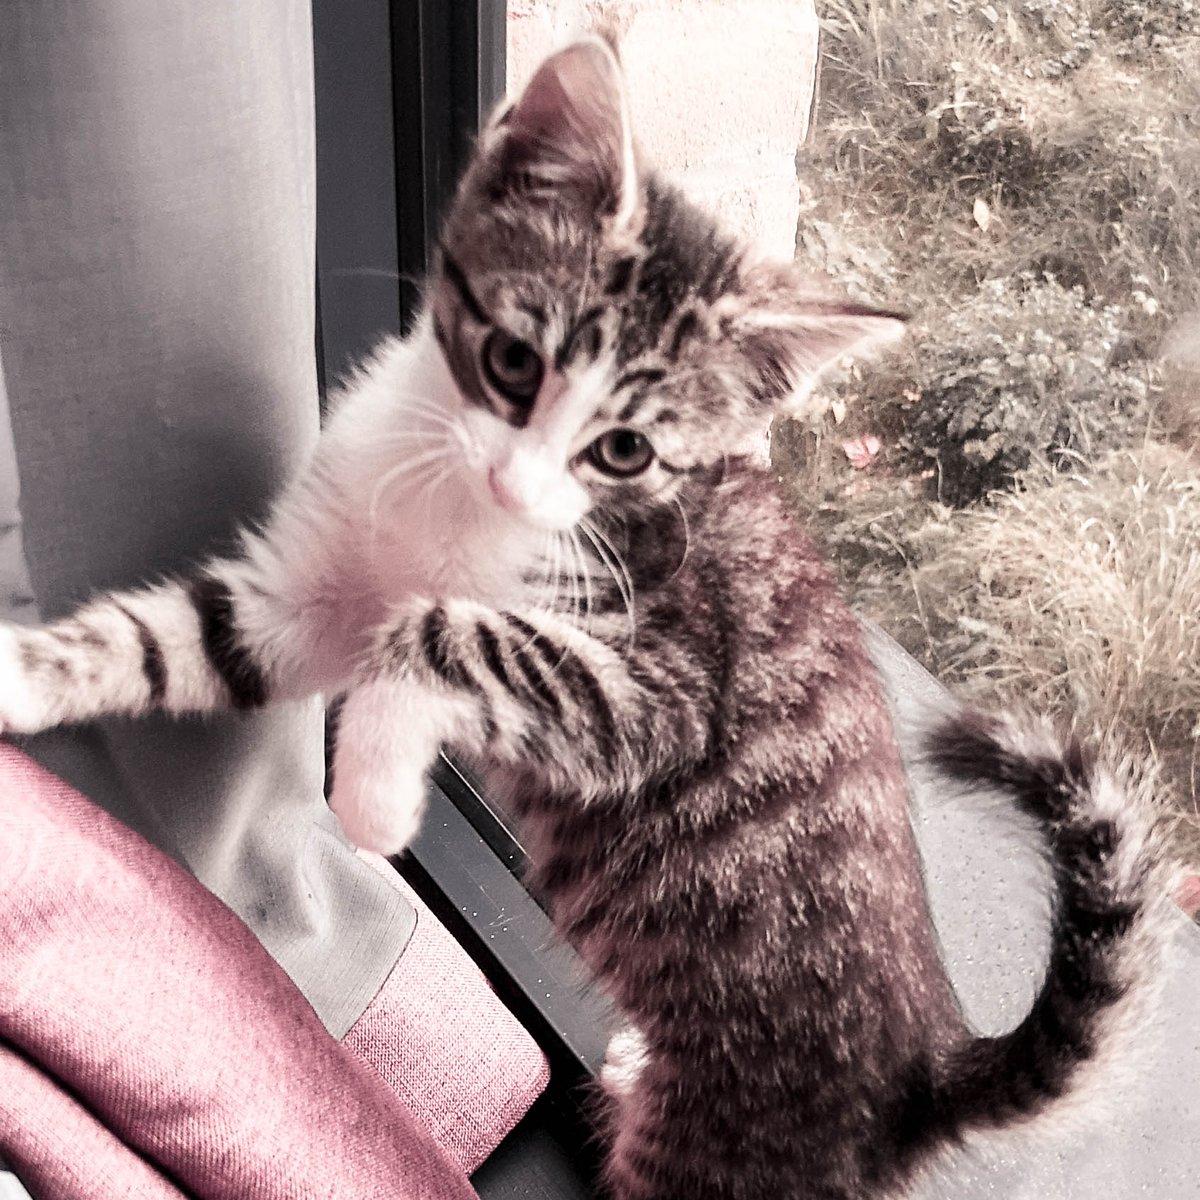 Curtains are for climbing?  #CatsOfTwitter #TwitterCats #Cat #Kitten #Cute #TabbyCat #TabbyTroop #JoyOfCatspic.twitter.com/77YtwUK3wy